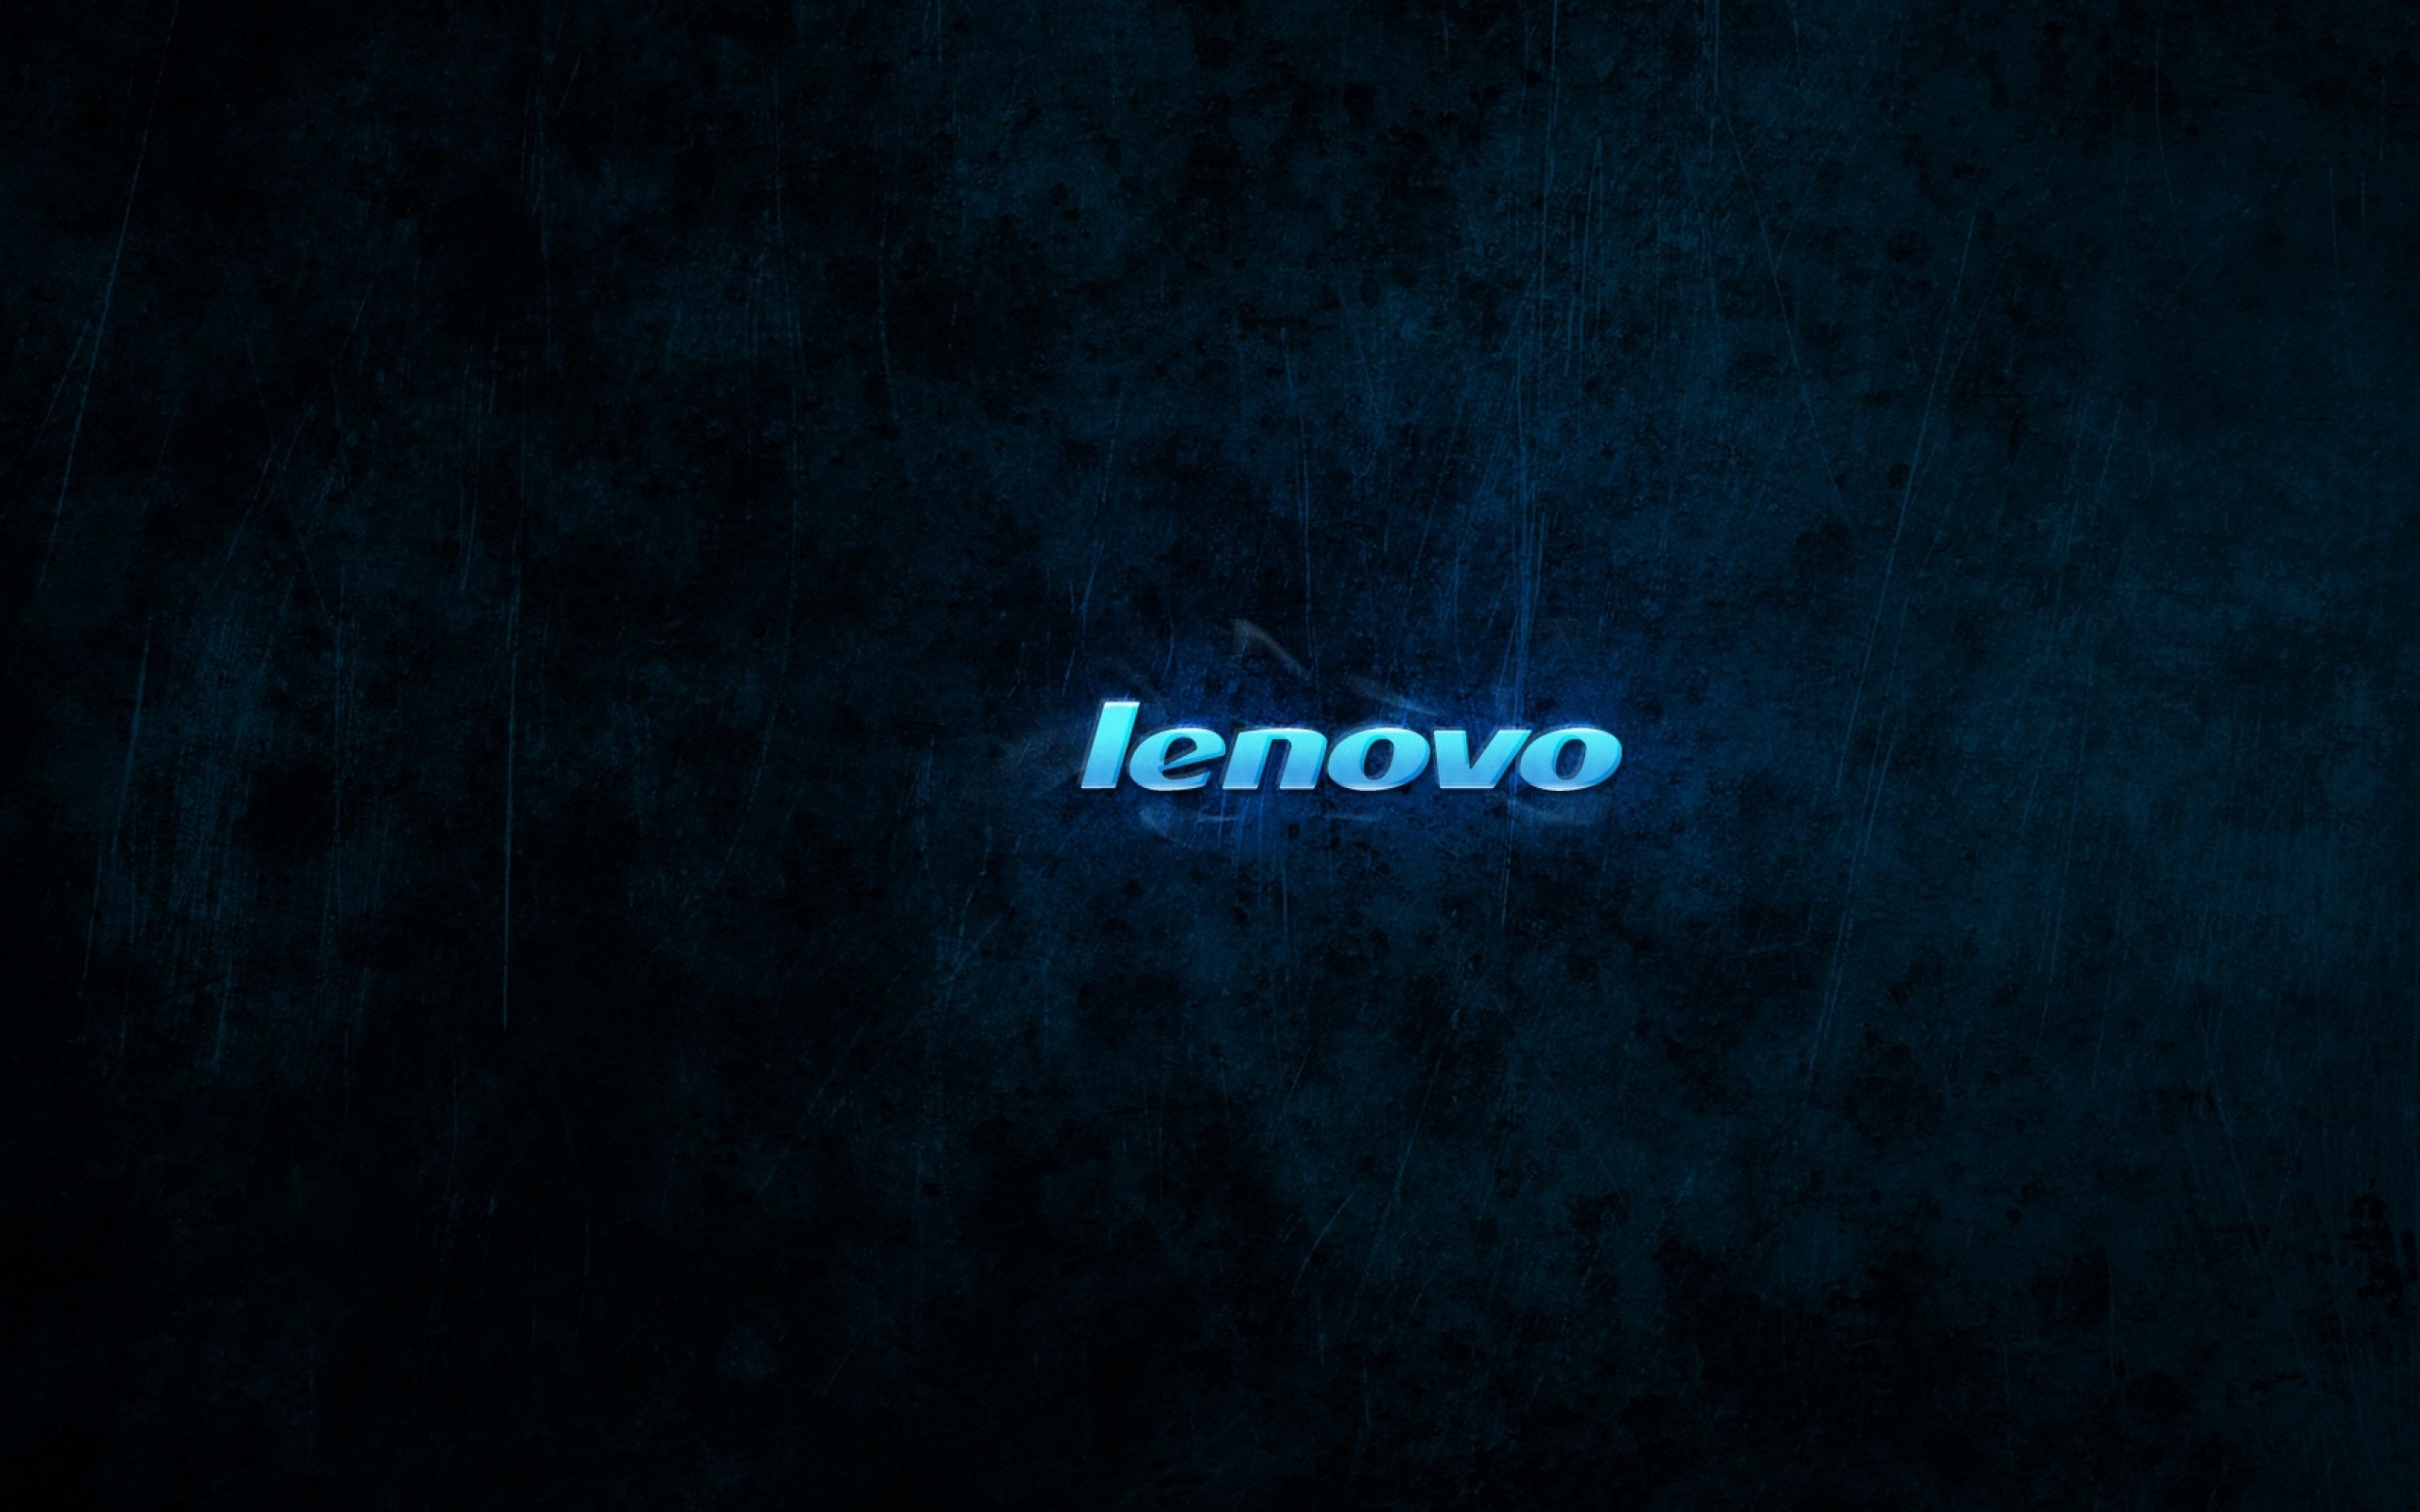 dark brands logos lenovo 1920x1080 wallpaper Art HD Wallpaper download 2560x1600